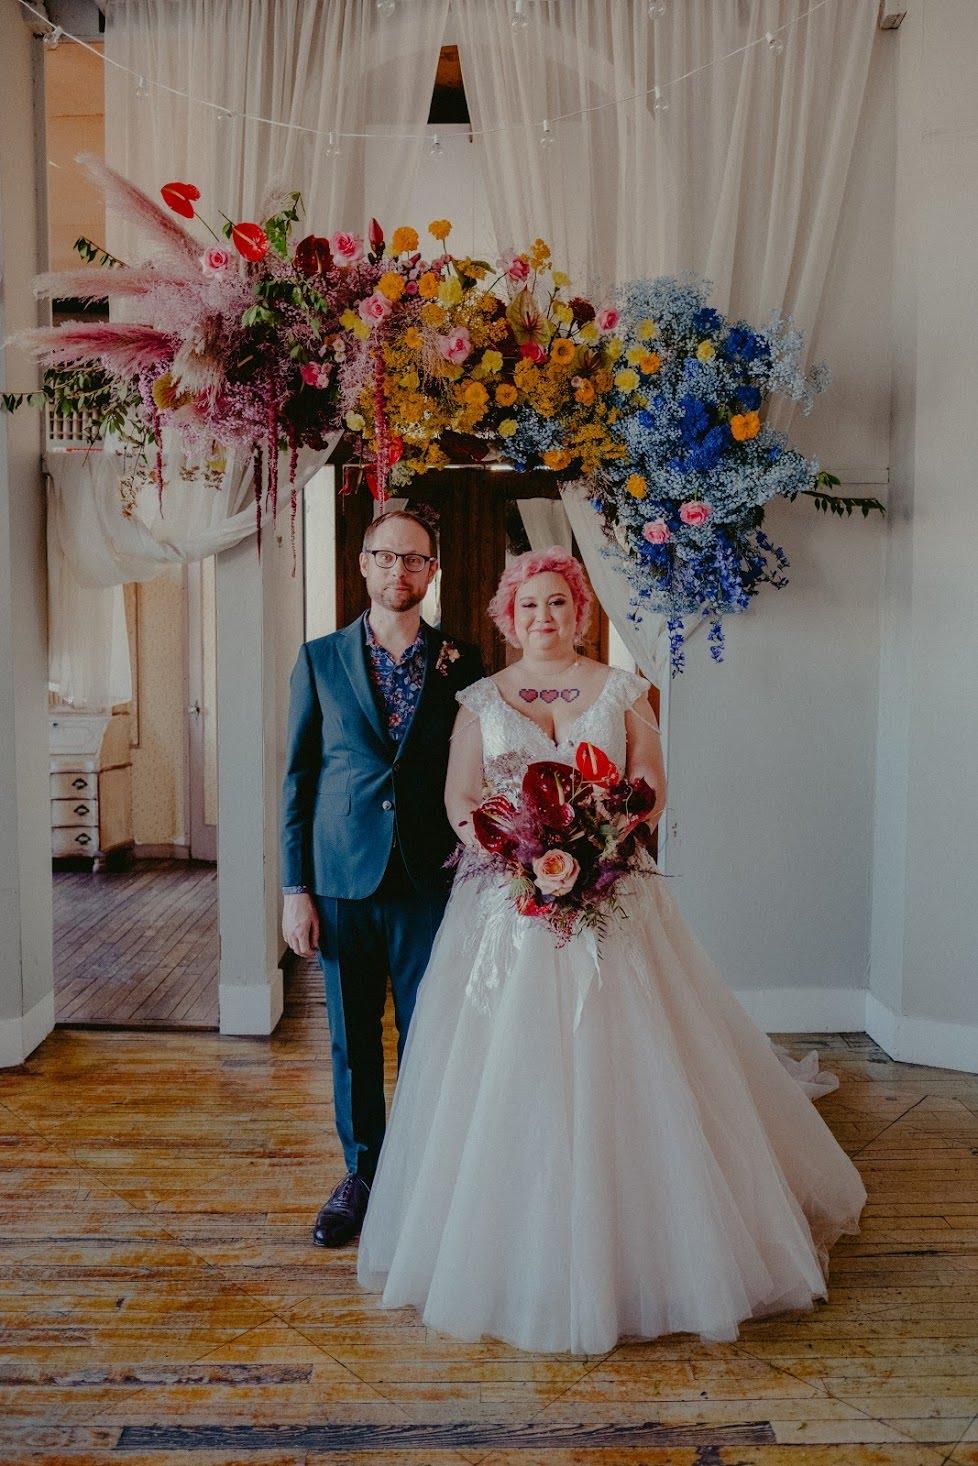 Diana&Eric_Metropolitan_Building_Wedding_ChelliseMichaelPhotography_2019-111